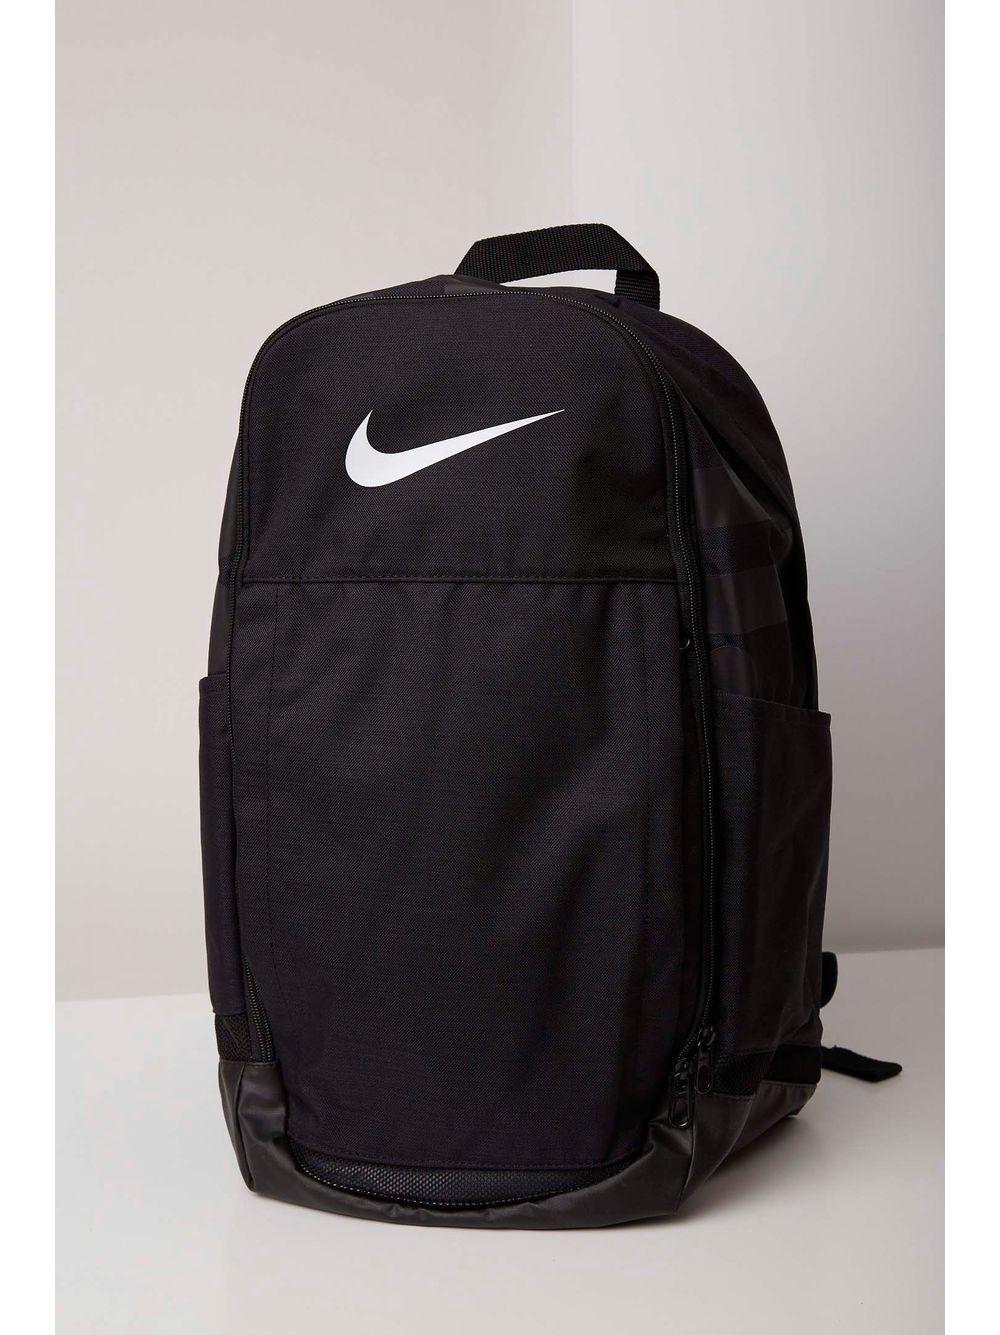 a1fdc0ad5 Mochila Esportiva Brasilia Extra Large Xi Nike Preto - pittol